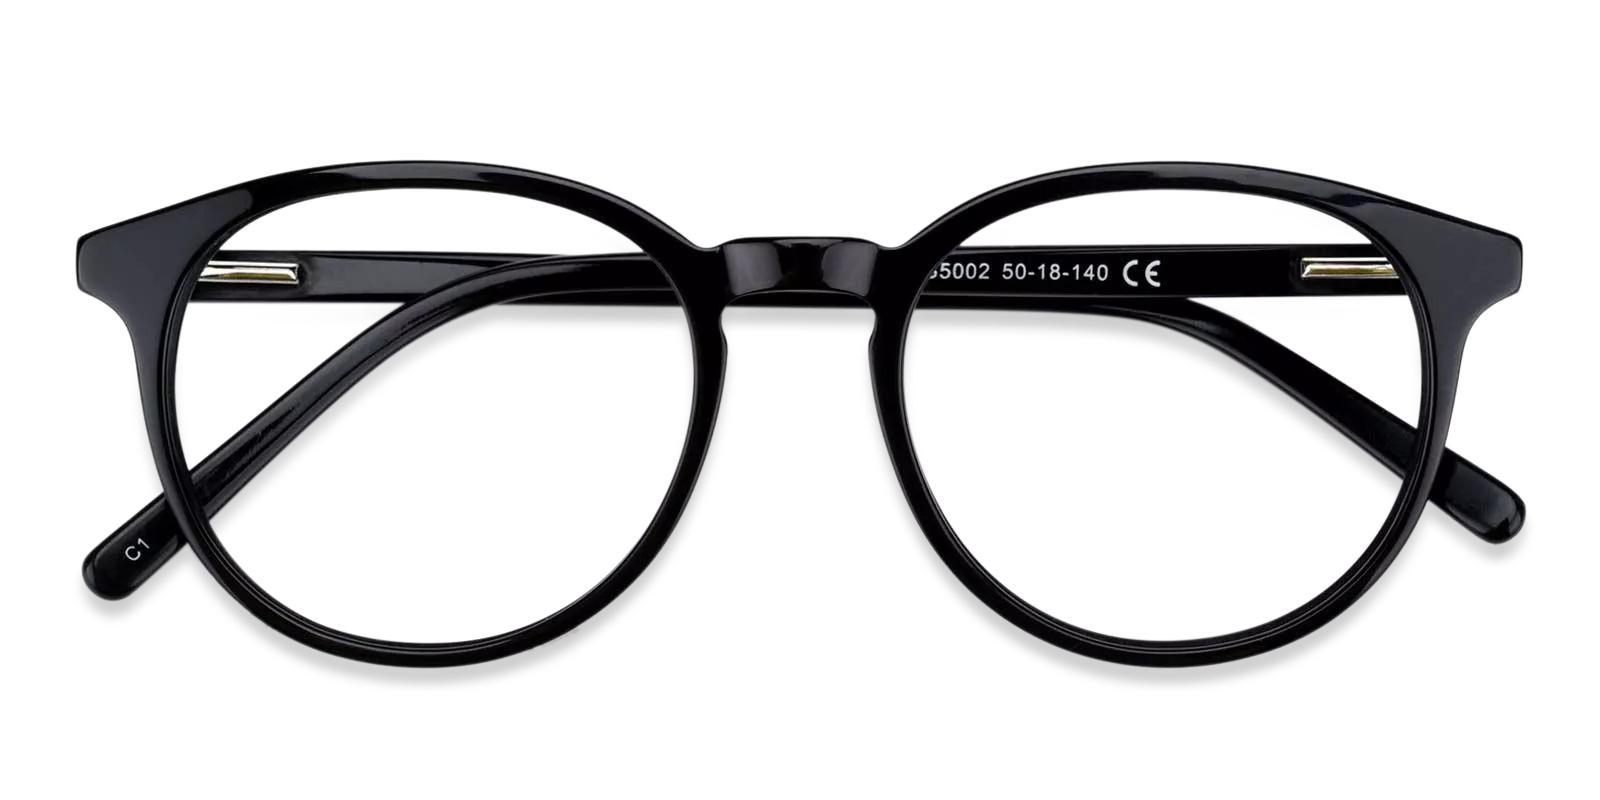 Tammy Black Acetate Eyeglasses , Fashion , SpringHinges , UniversalBridgeFit Frames from ABBE Glasses